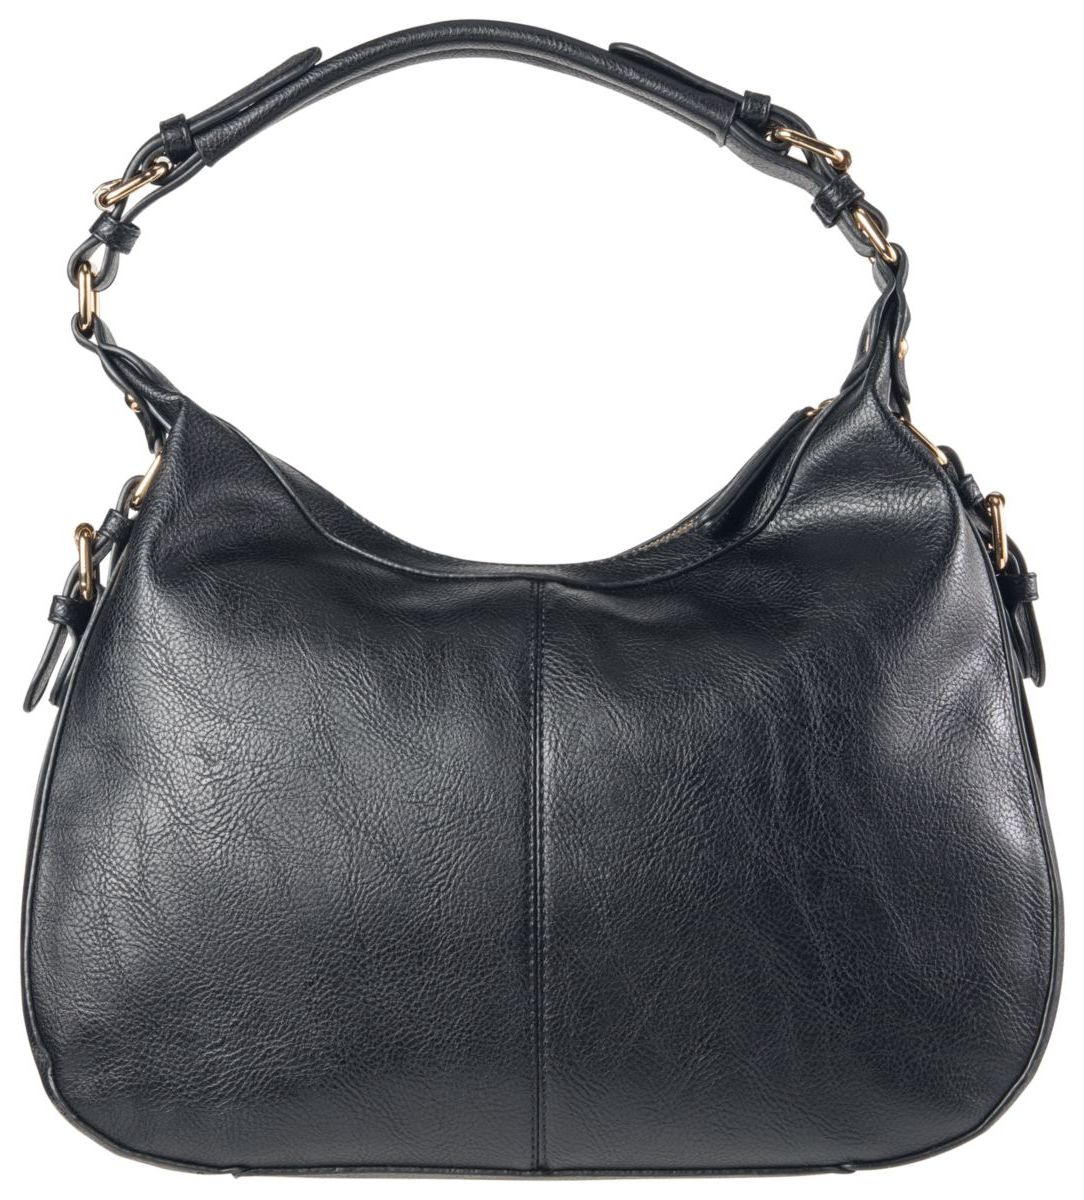 Emperia® Chloe Concealed-Carry Hobo Handbag